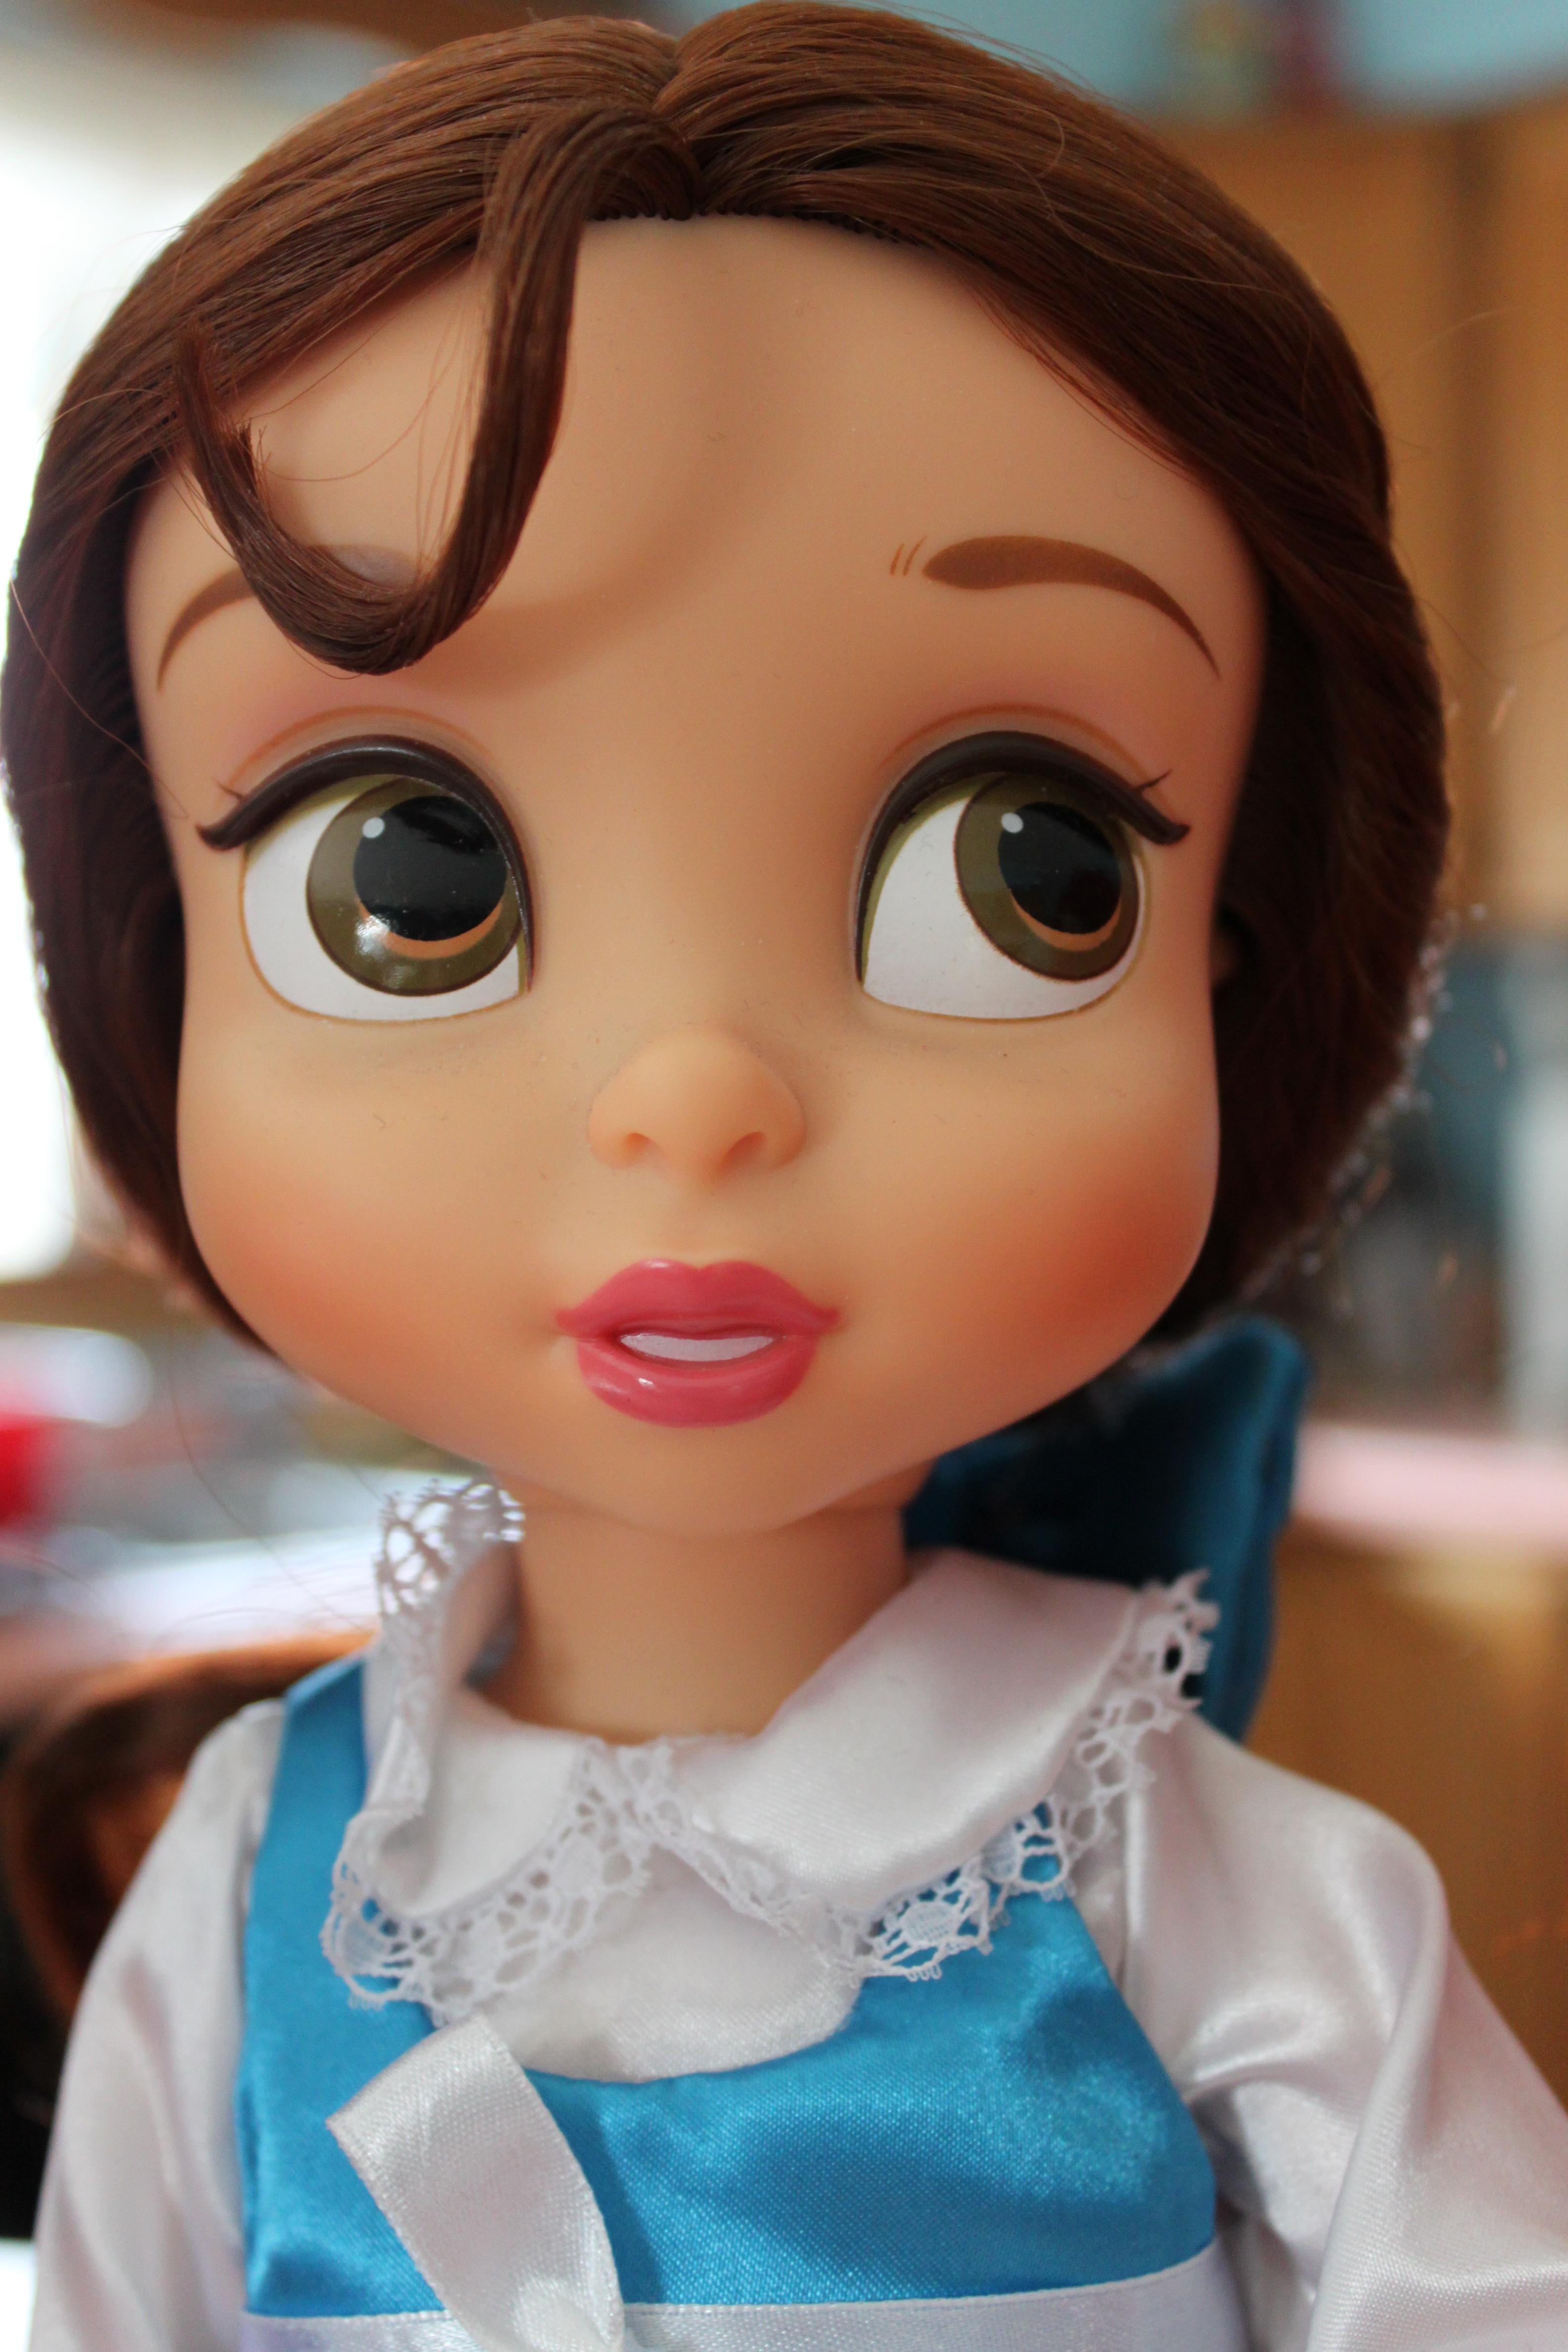 Top Toys For Christmas 2012 Mattel Sister Sets Amp Disney